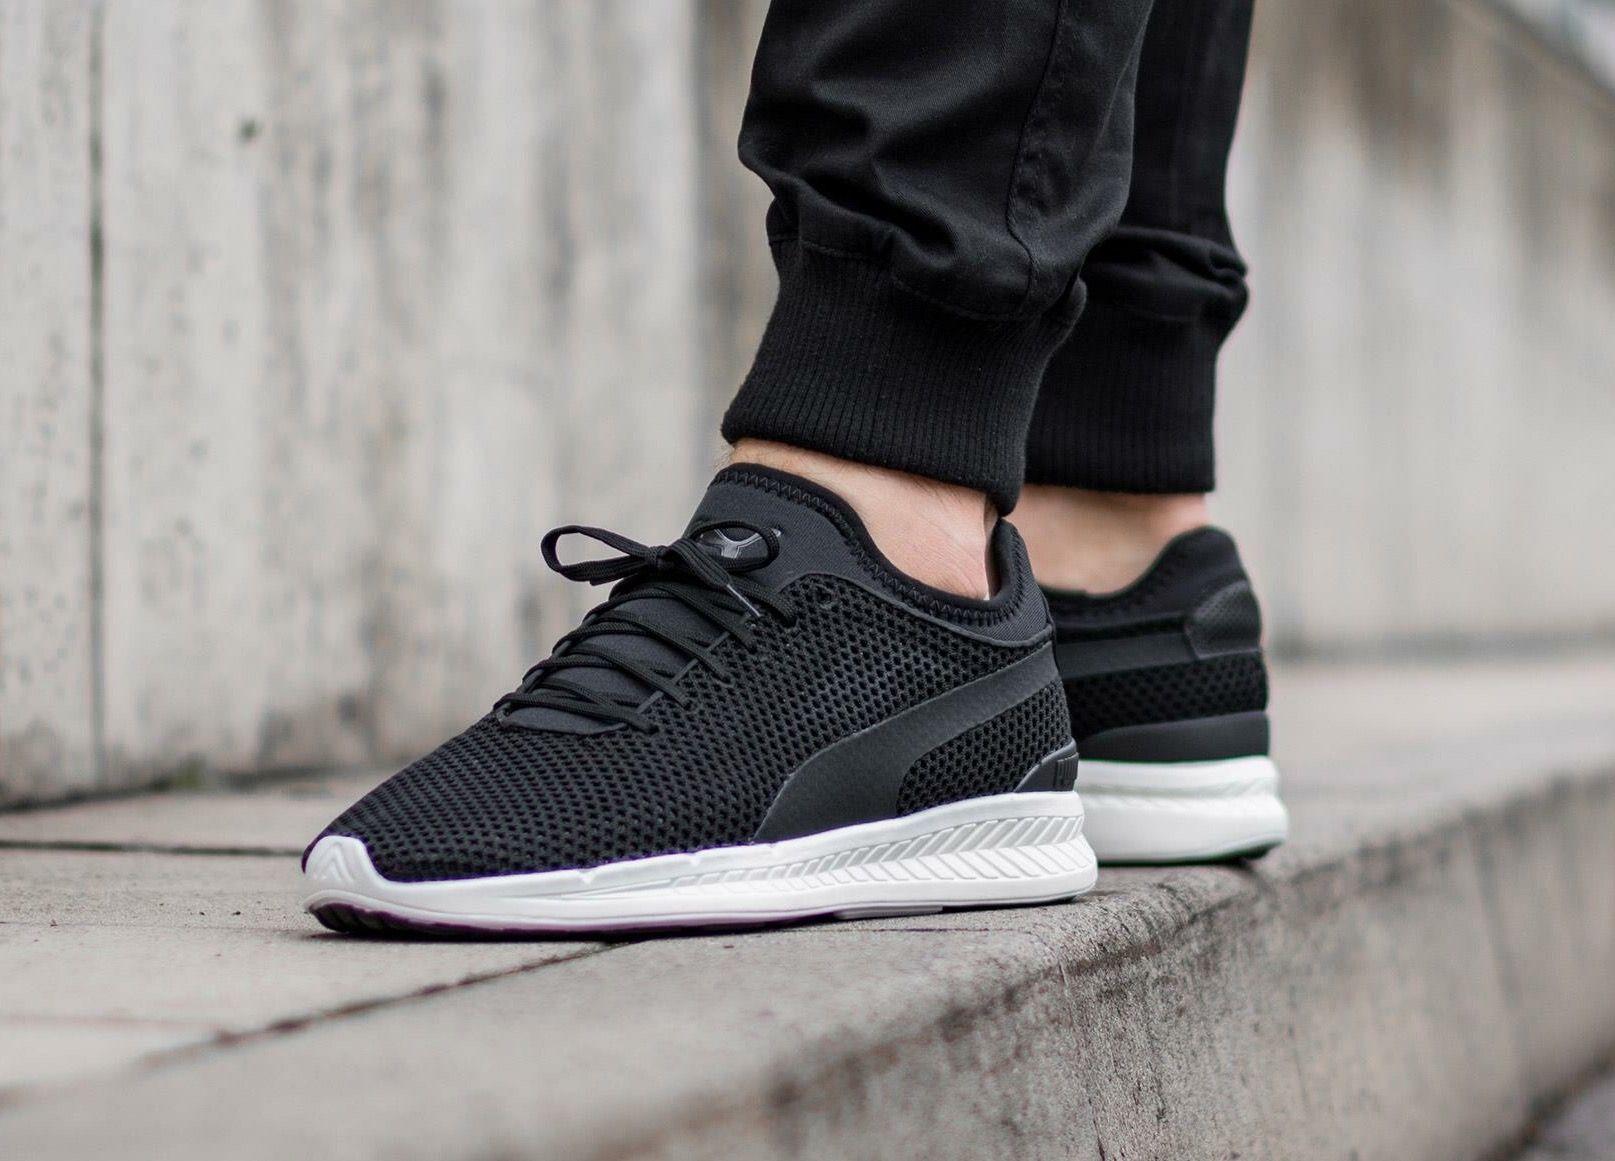 puma hommes chaussures 2018